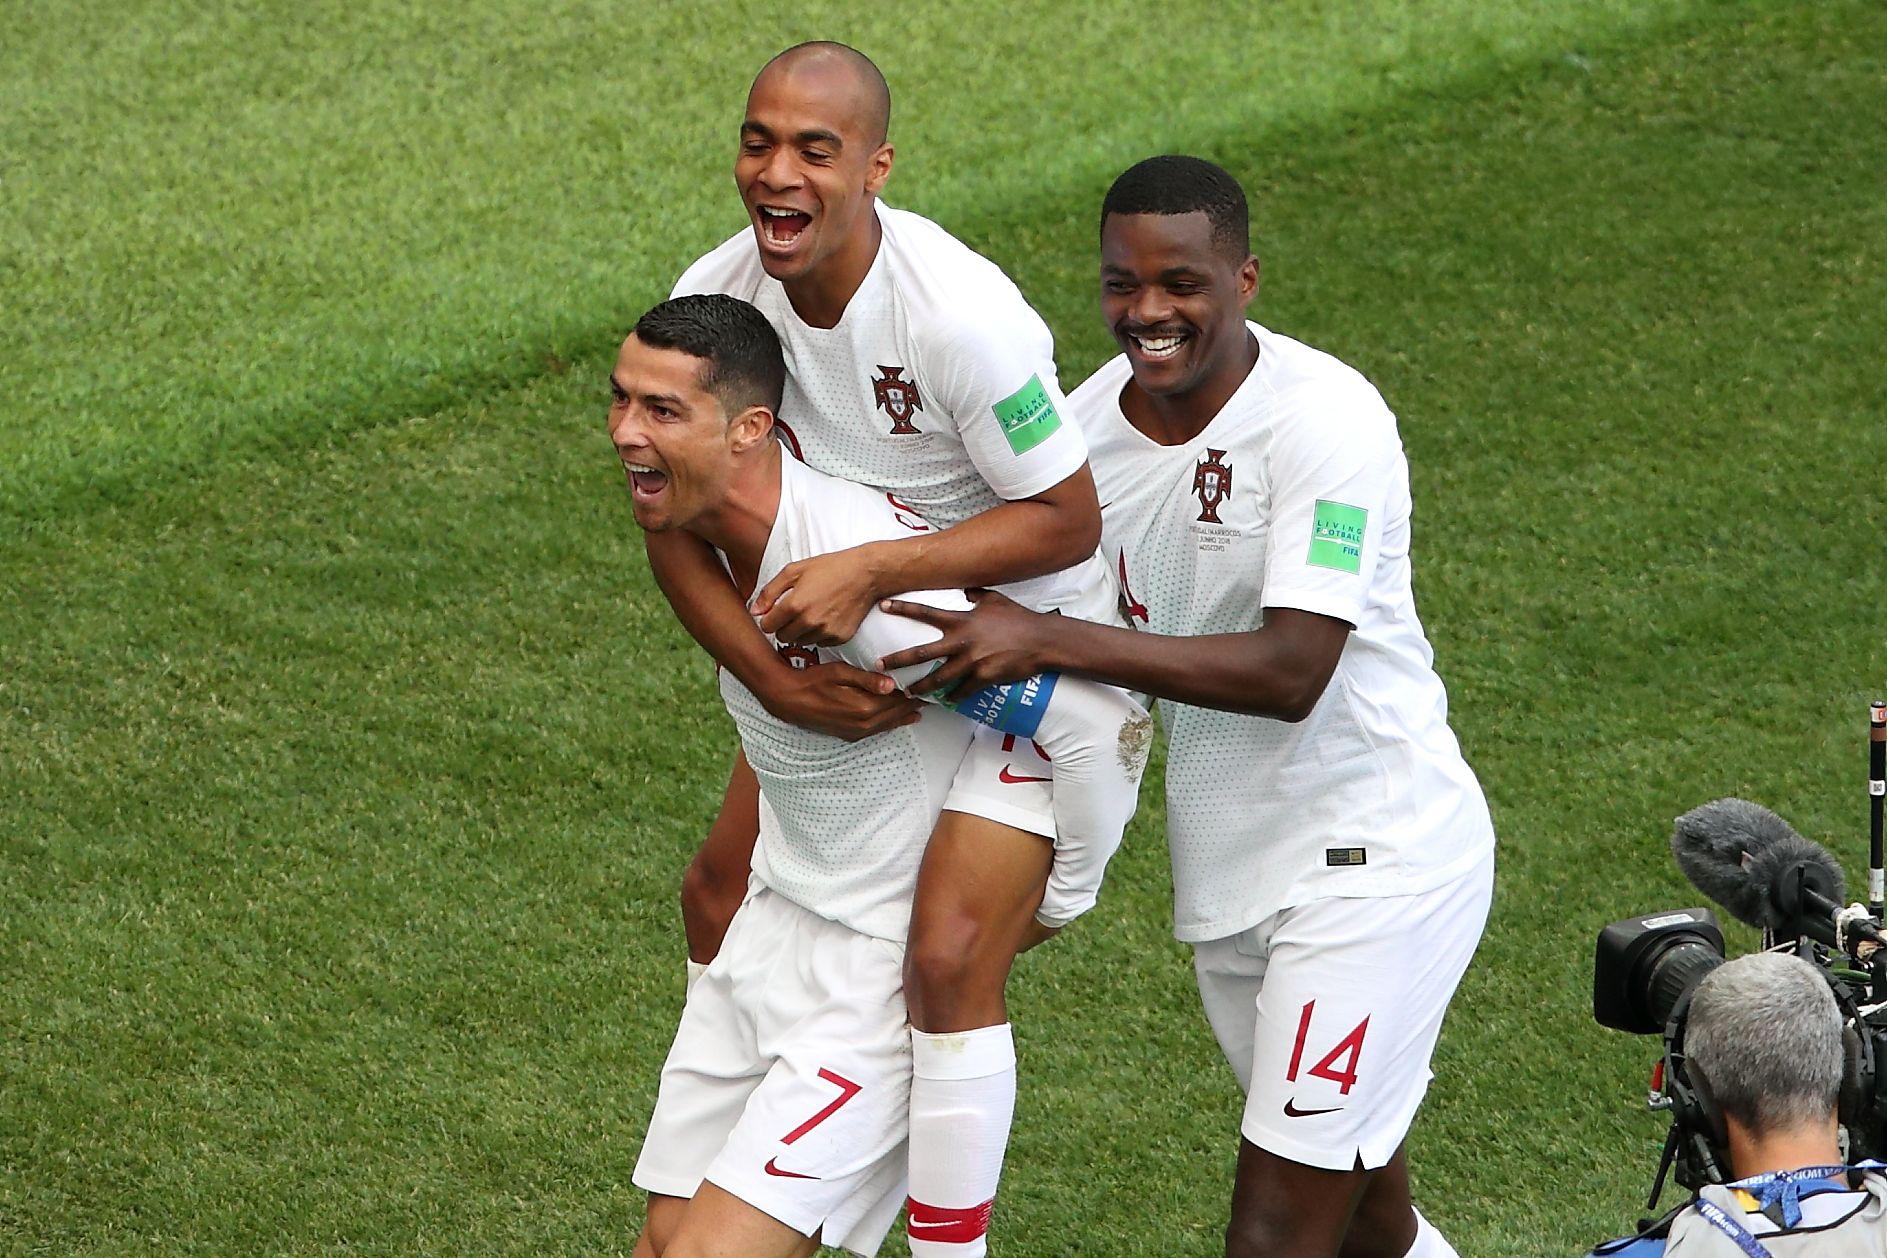 Футбол, Лига наций, Португалия - Франция, прямая текстовая онлайн трансляция